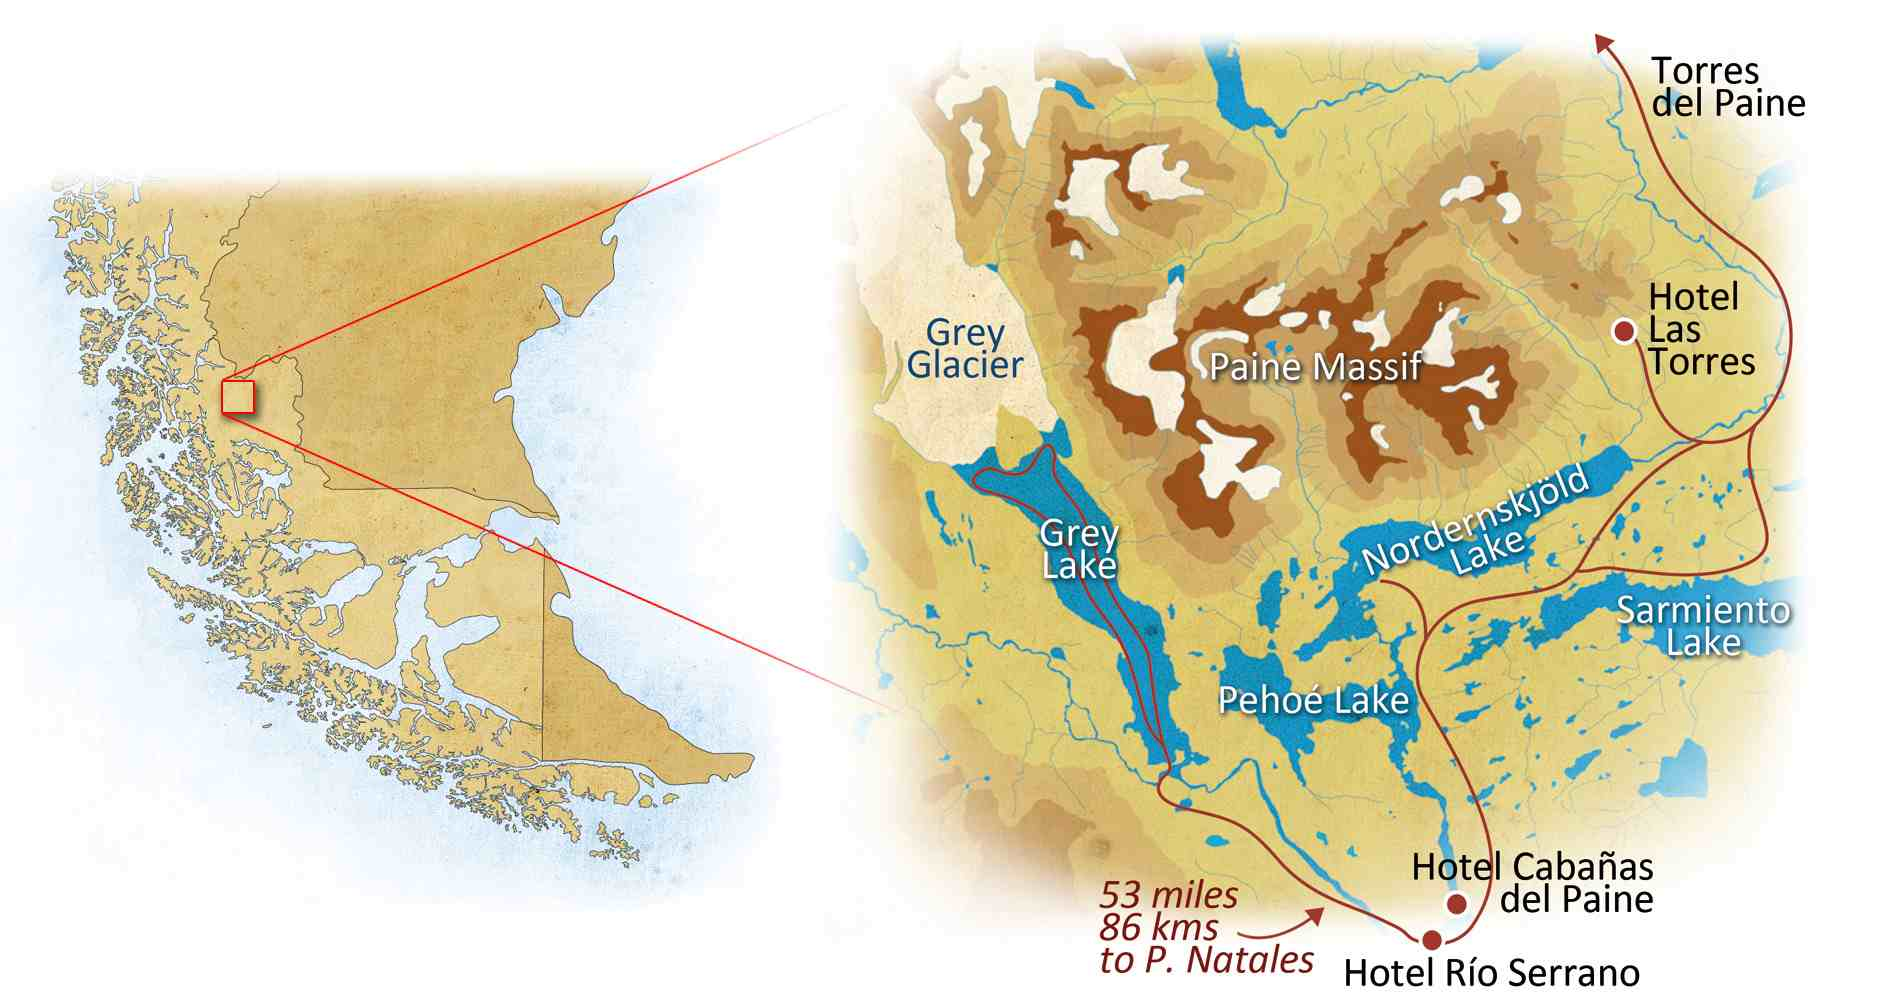 Torres del Paine Explorer Trip Map